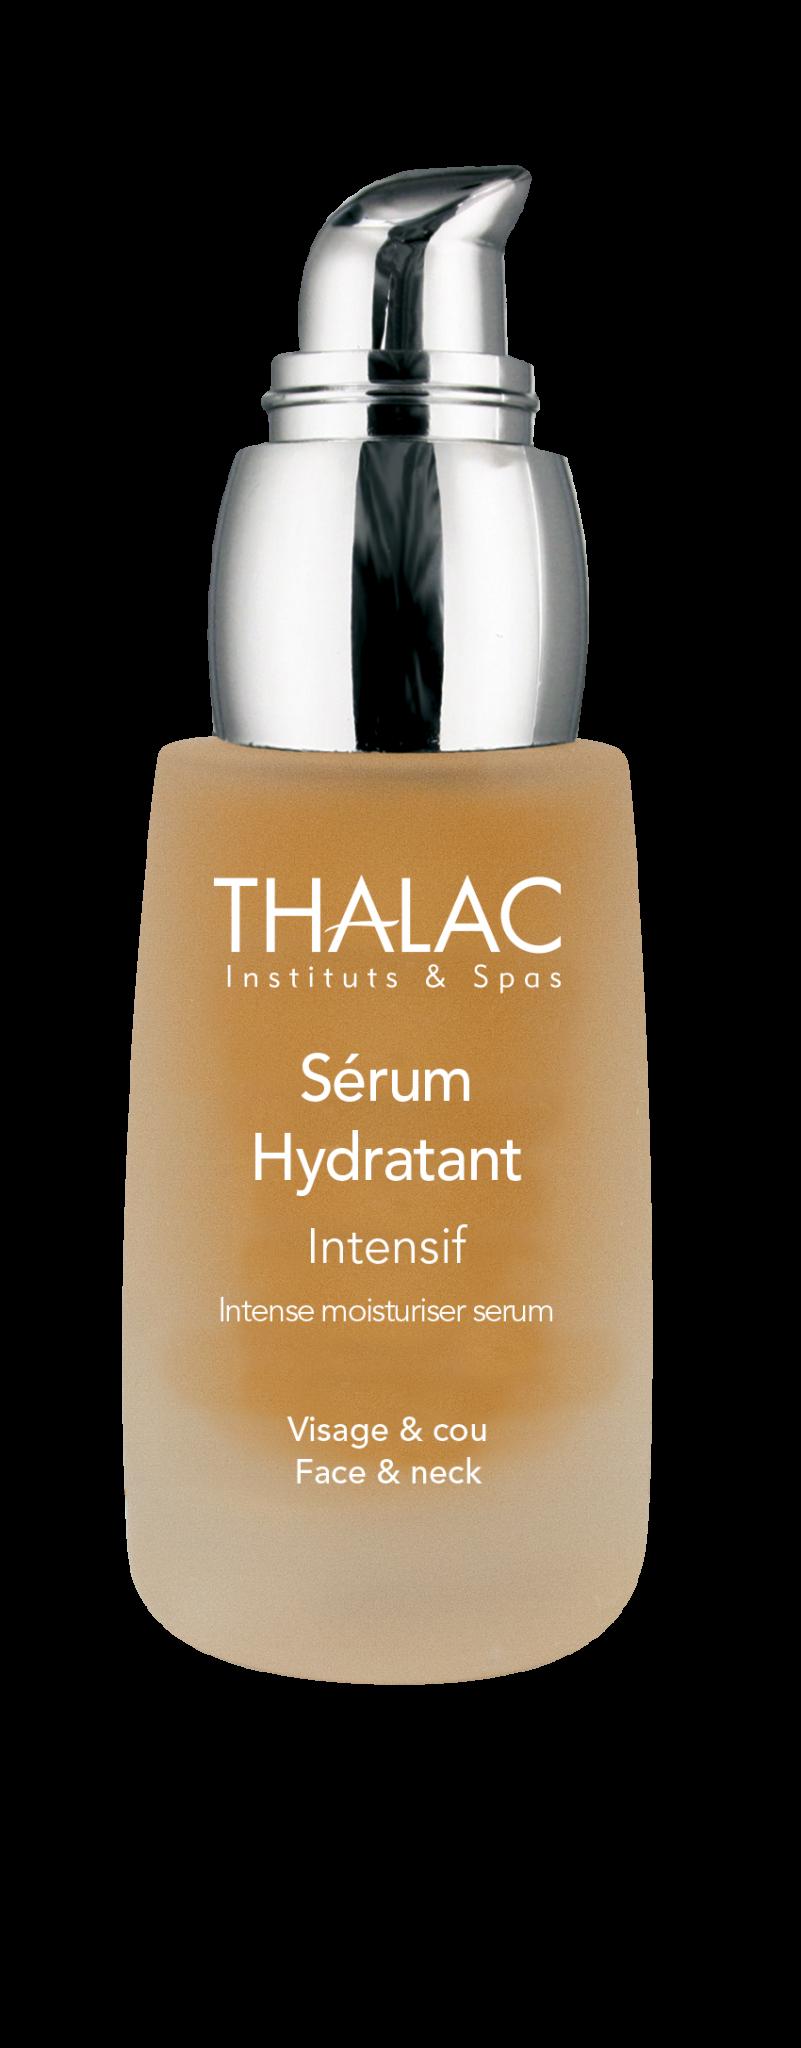 Serum Hydratant